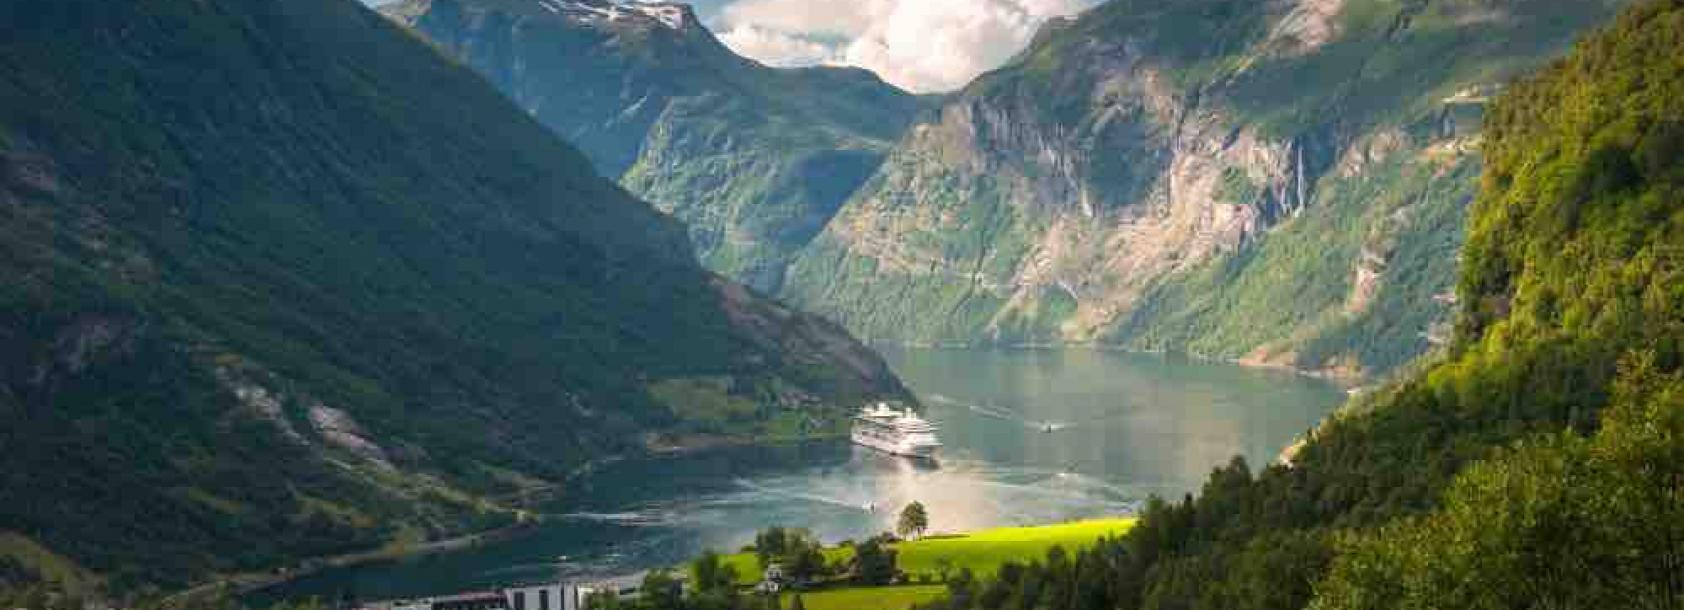 Norway_Geiranger fjord